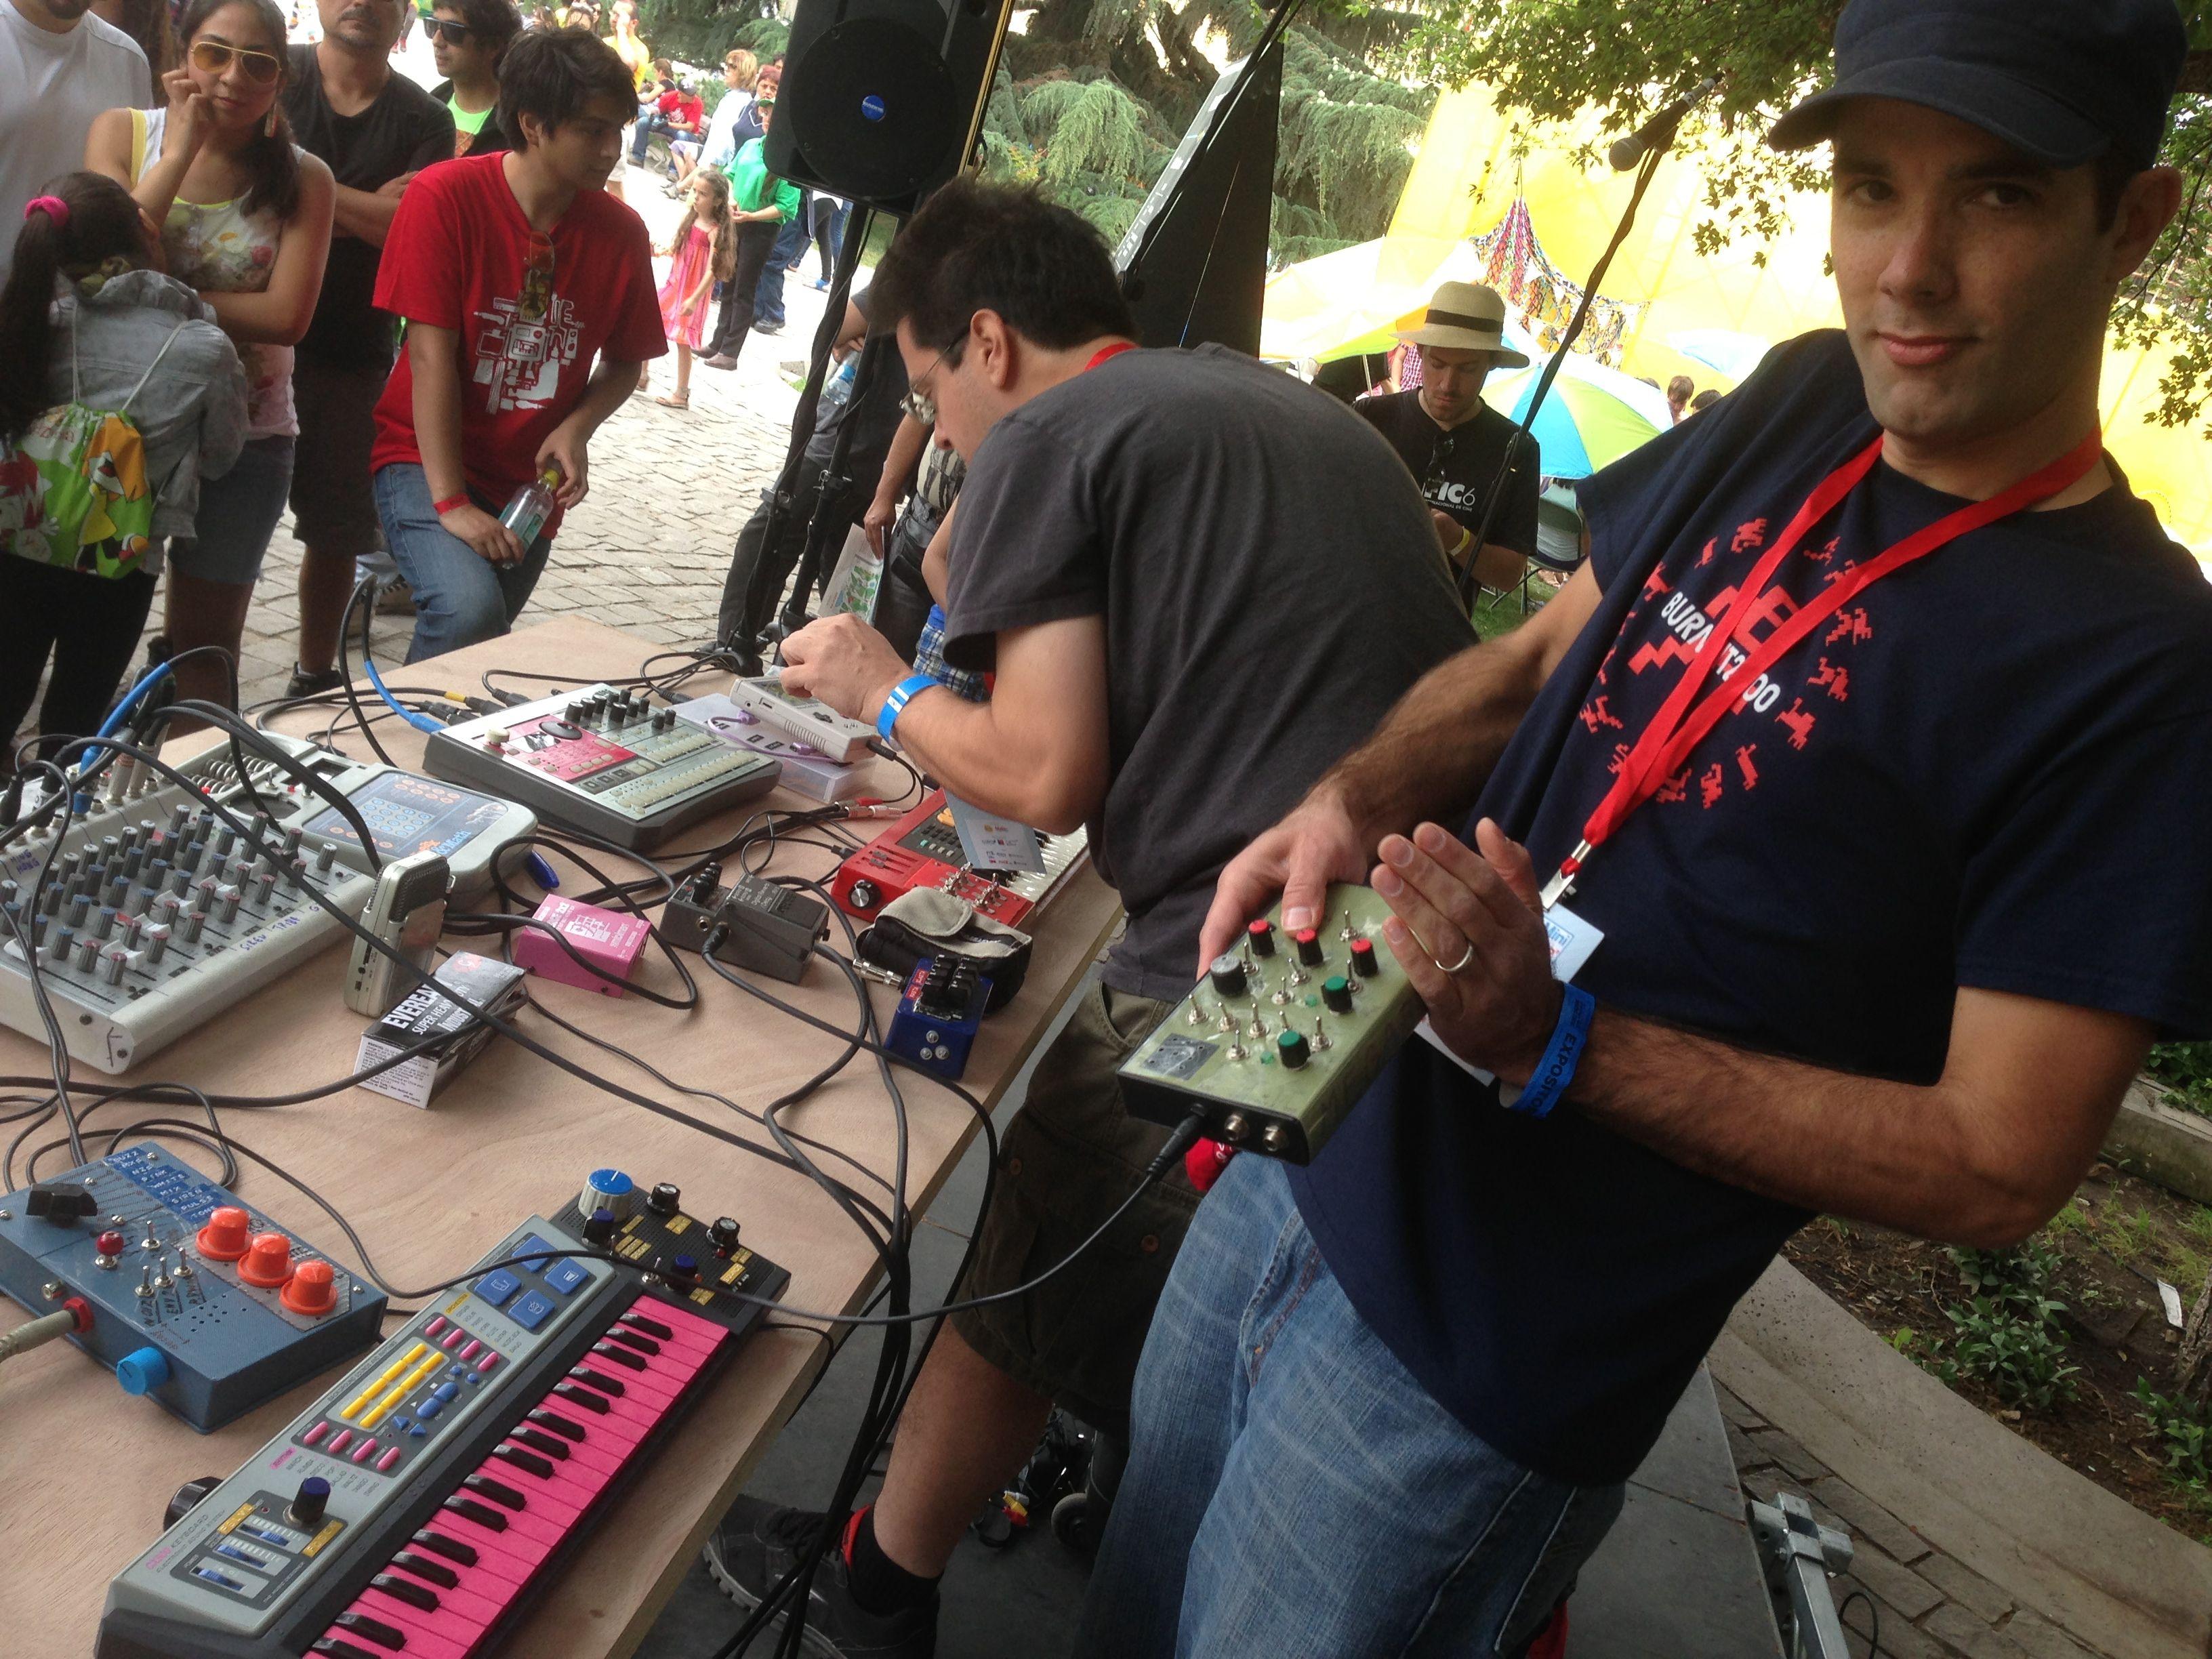 Burnkit2600 jamming at the Santiago Mini Maker Faire (photo by Sabrina Merlo)